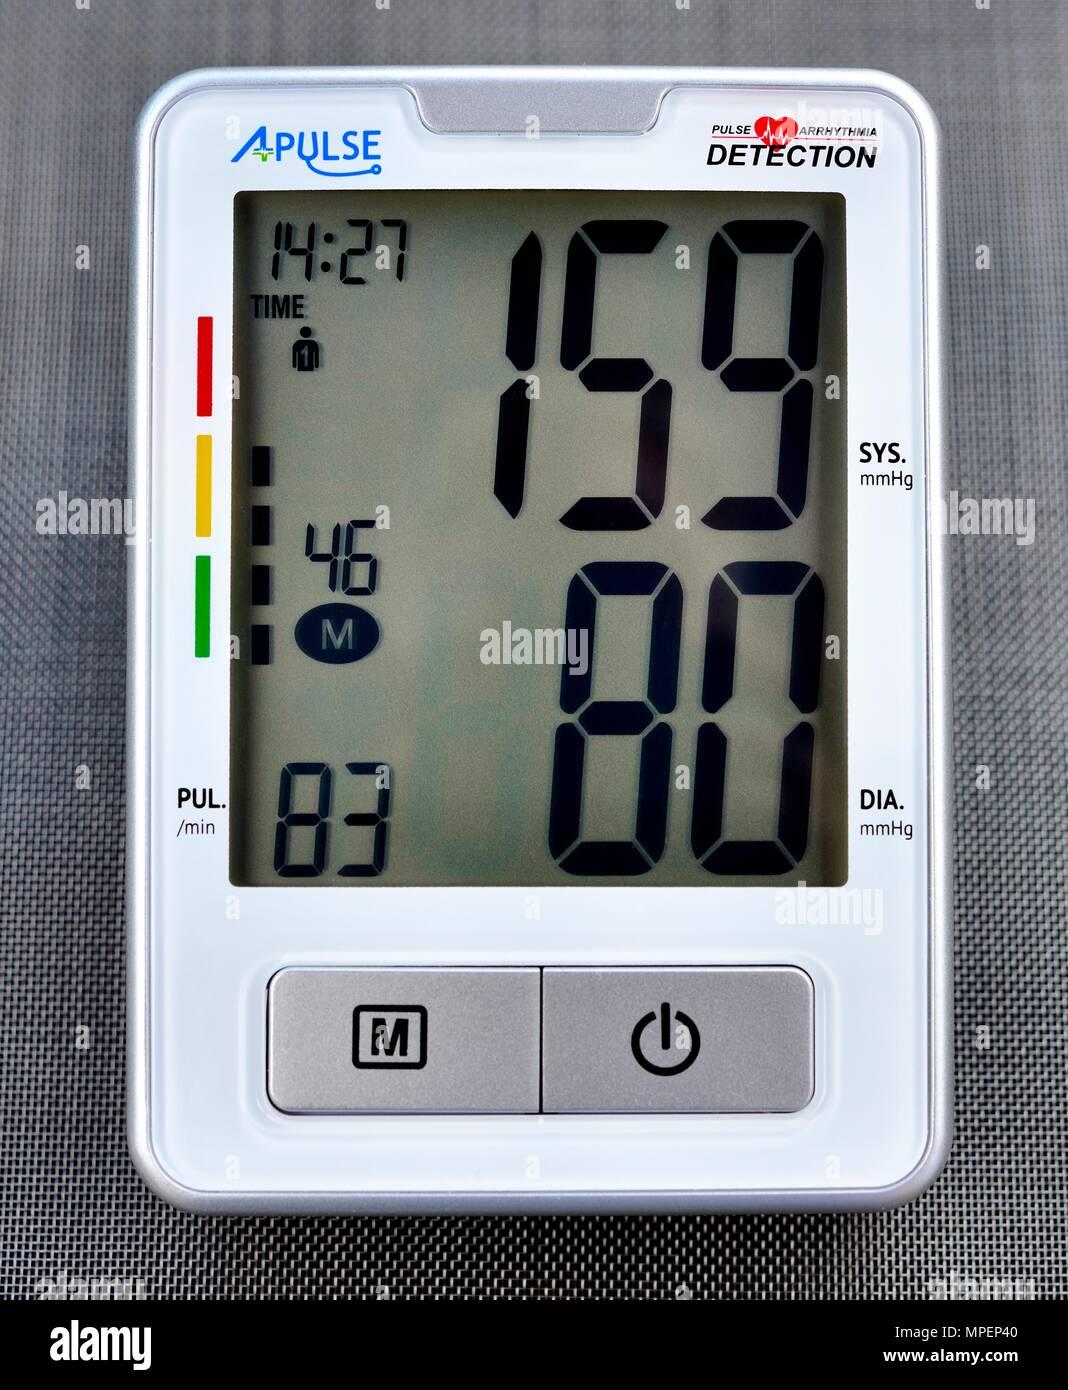 Upper Arm Digital Blood Pressure Monitor 159/80 mmHg - Stock Image